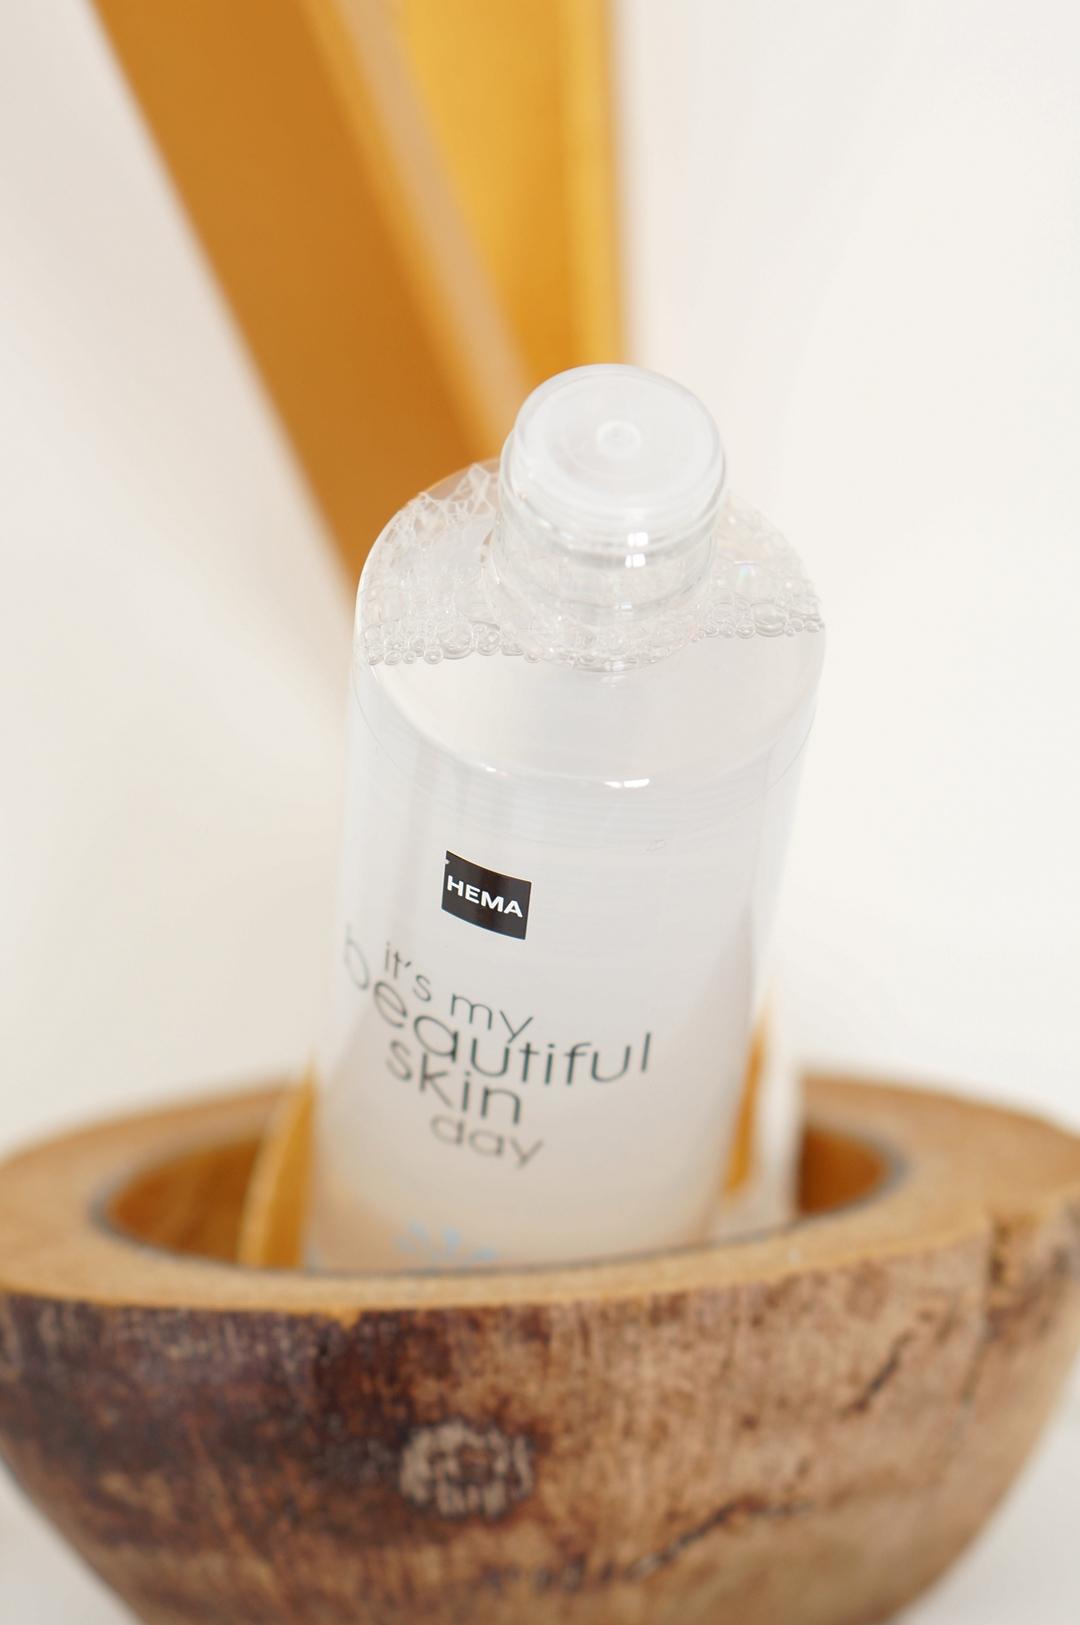 HEMA 3 in 1 micellair cleansing water